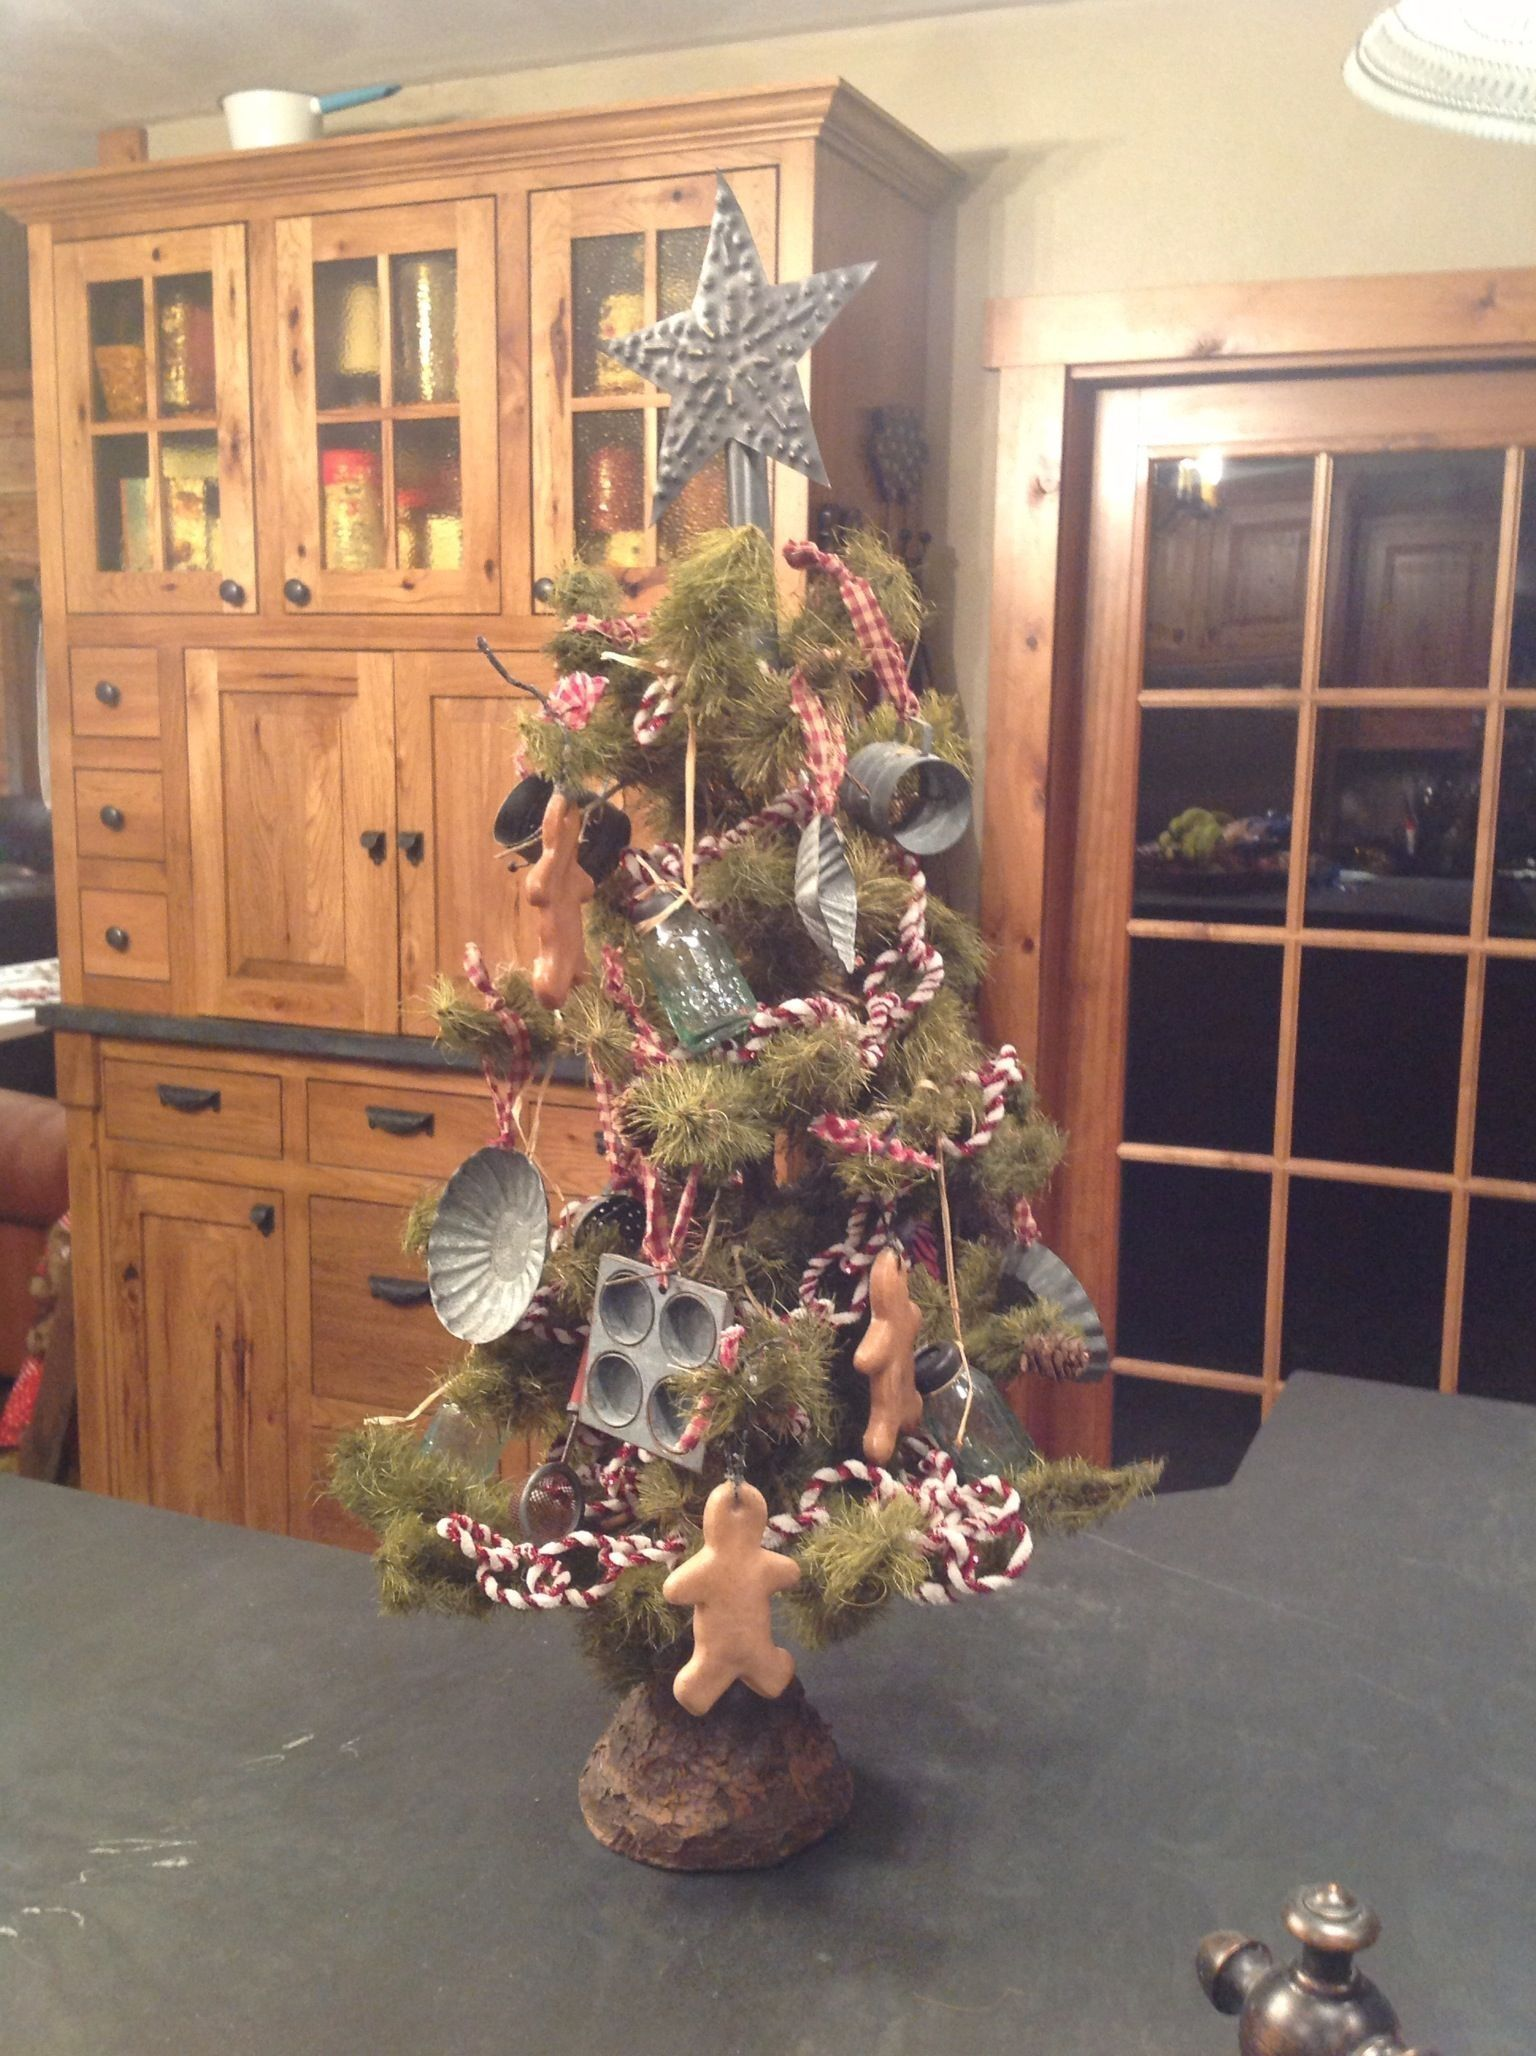 101 DIY Rustic Christmas Ornaments Ideas for Christmas ...